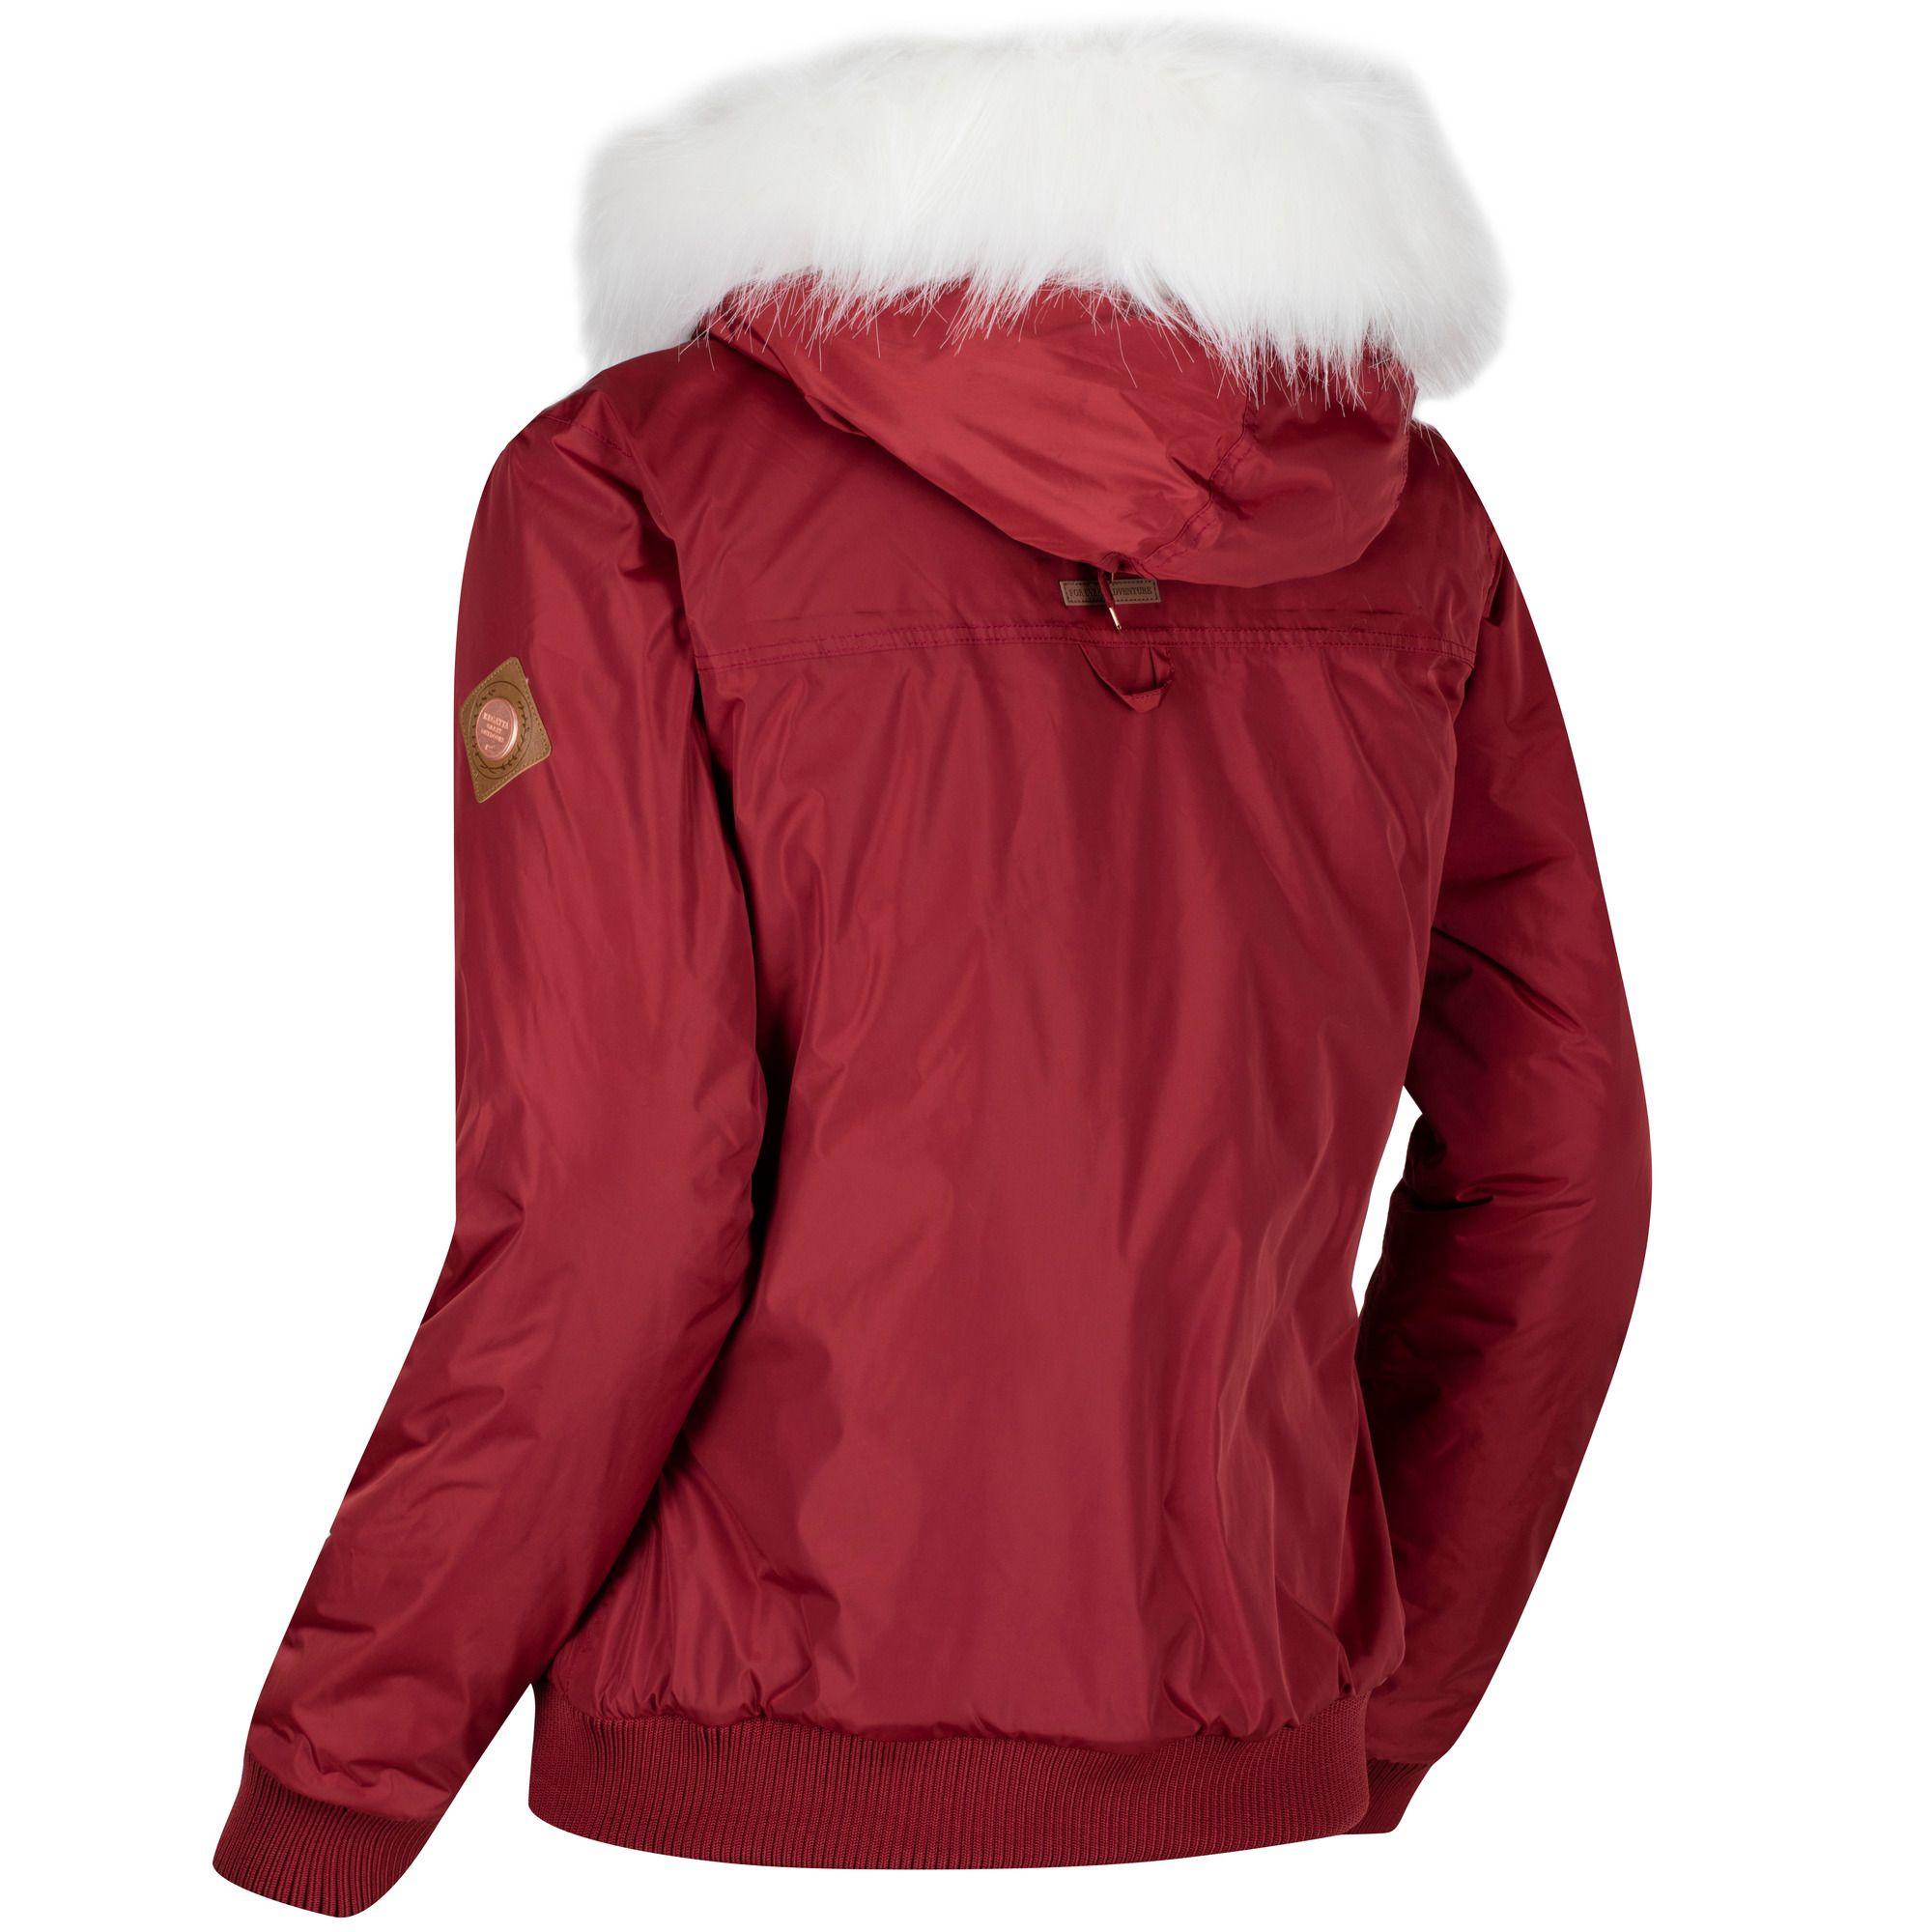 Regatta-Womens-Ladies-Berdine-Bomber-Jacket-RG3110 thumbnail 7